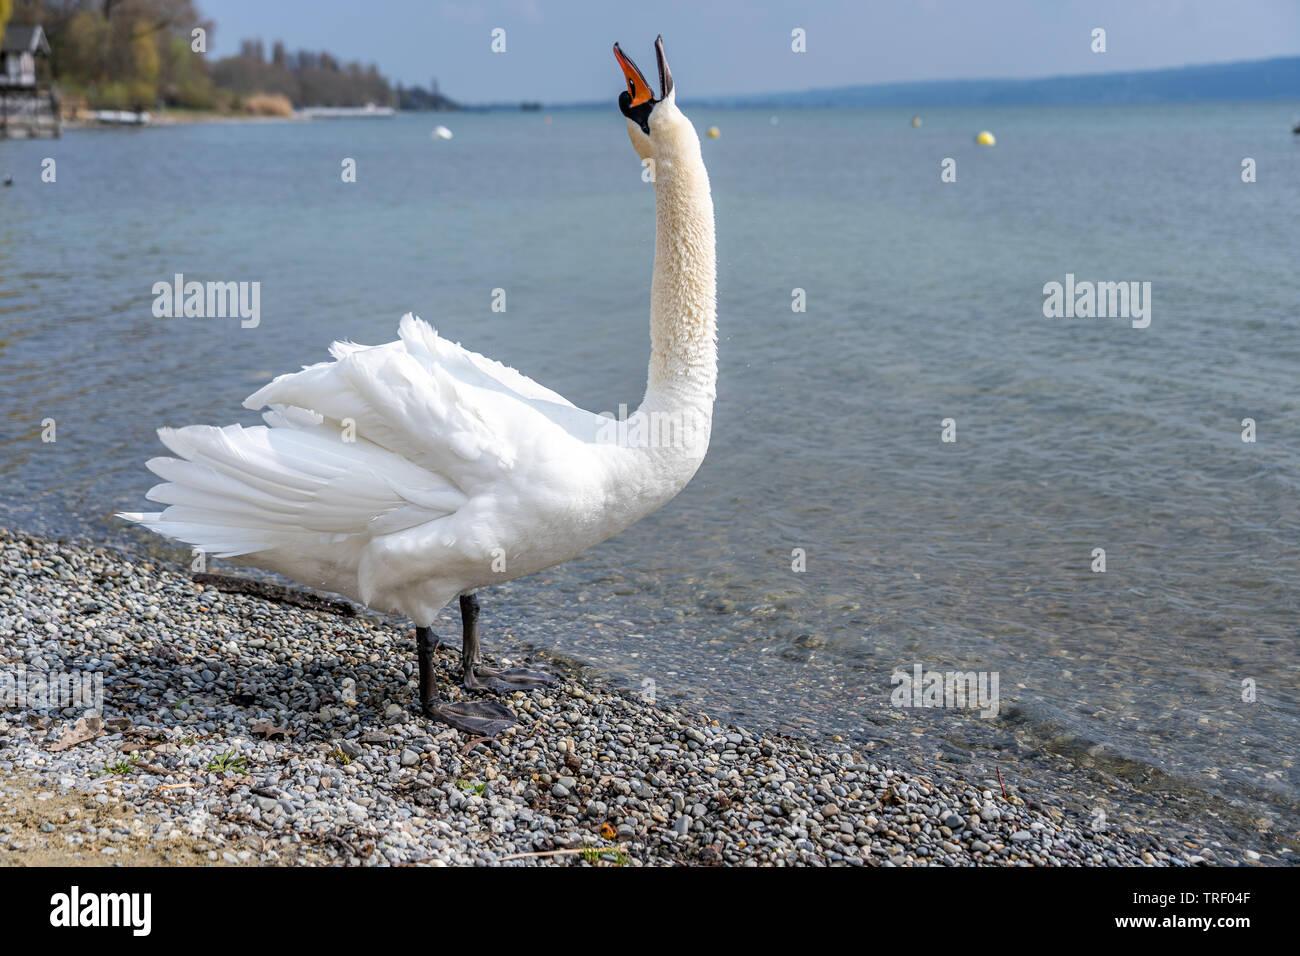 White swan in water scene, frankfurt, hesse, germany - Stock Image